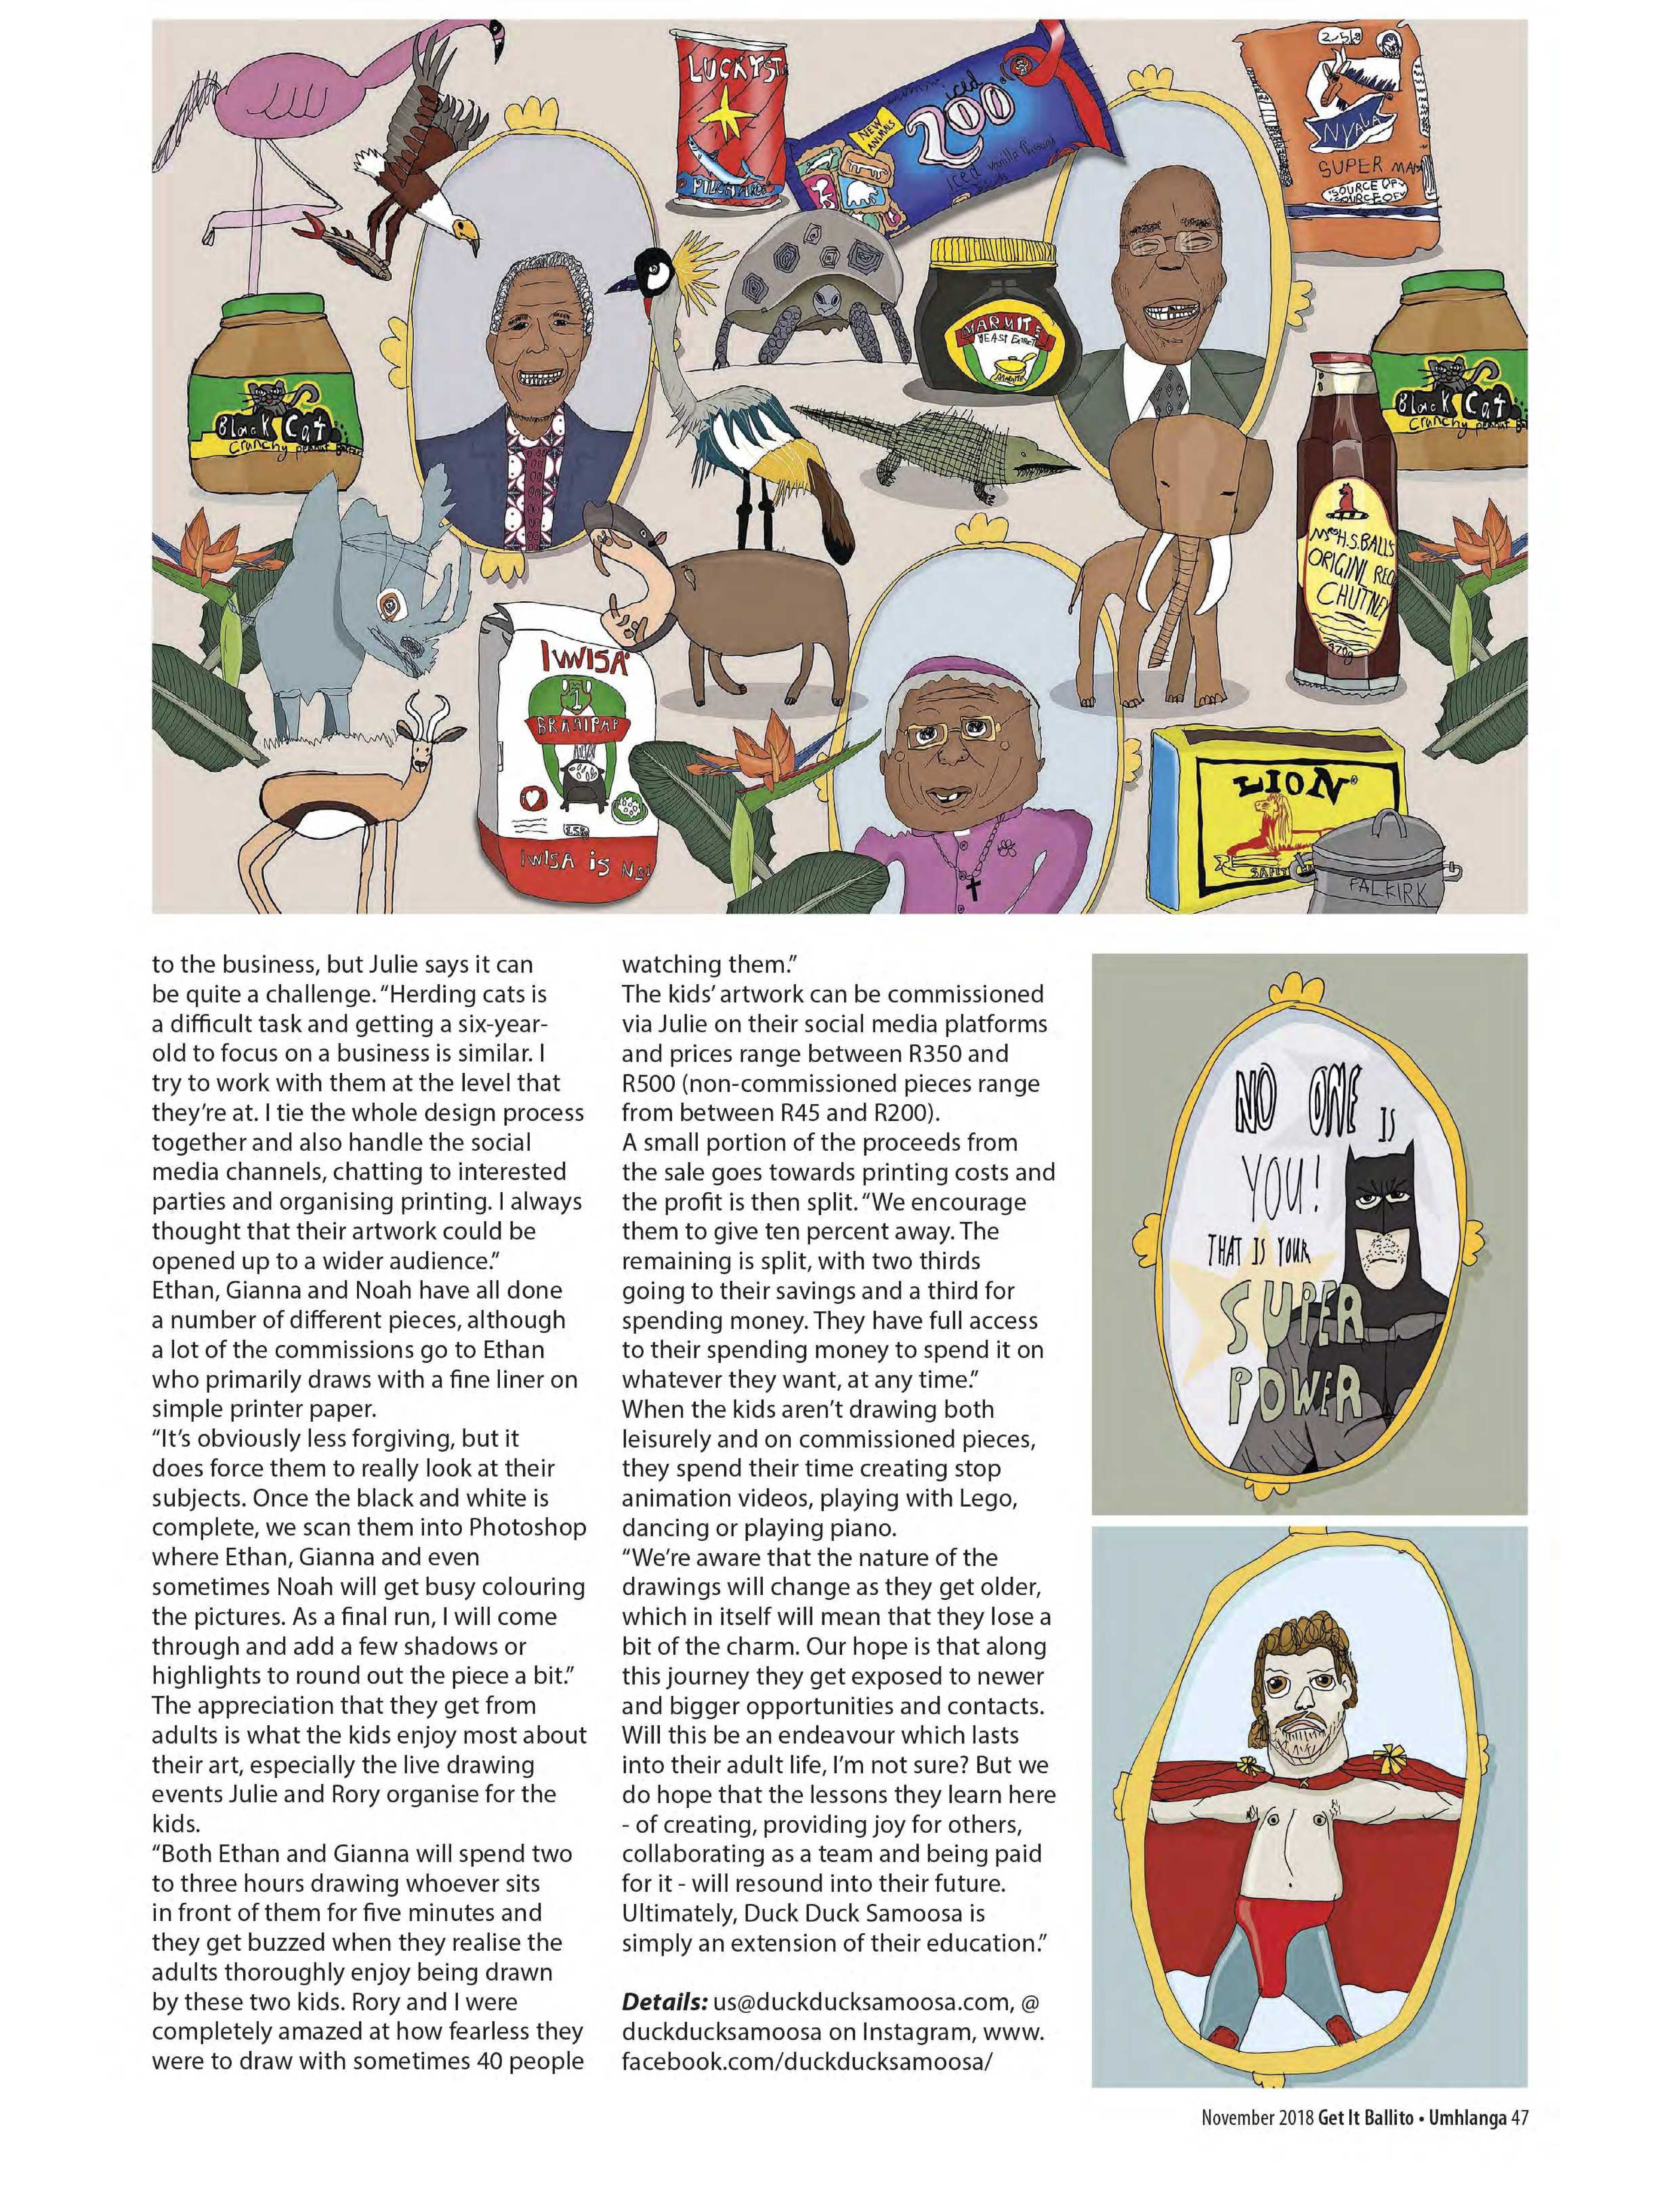 get-magazine-ballitoumhlanga-november-2018-epapers-page-49